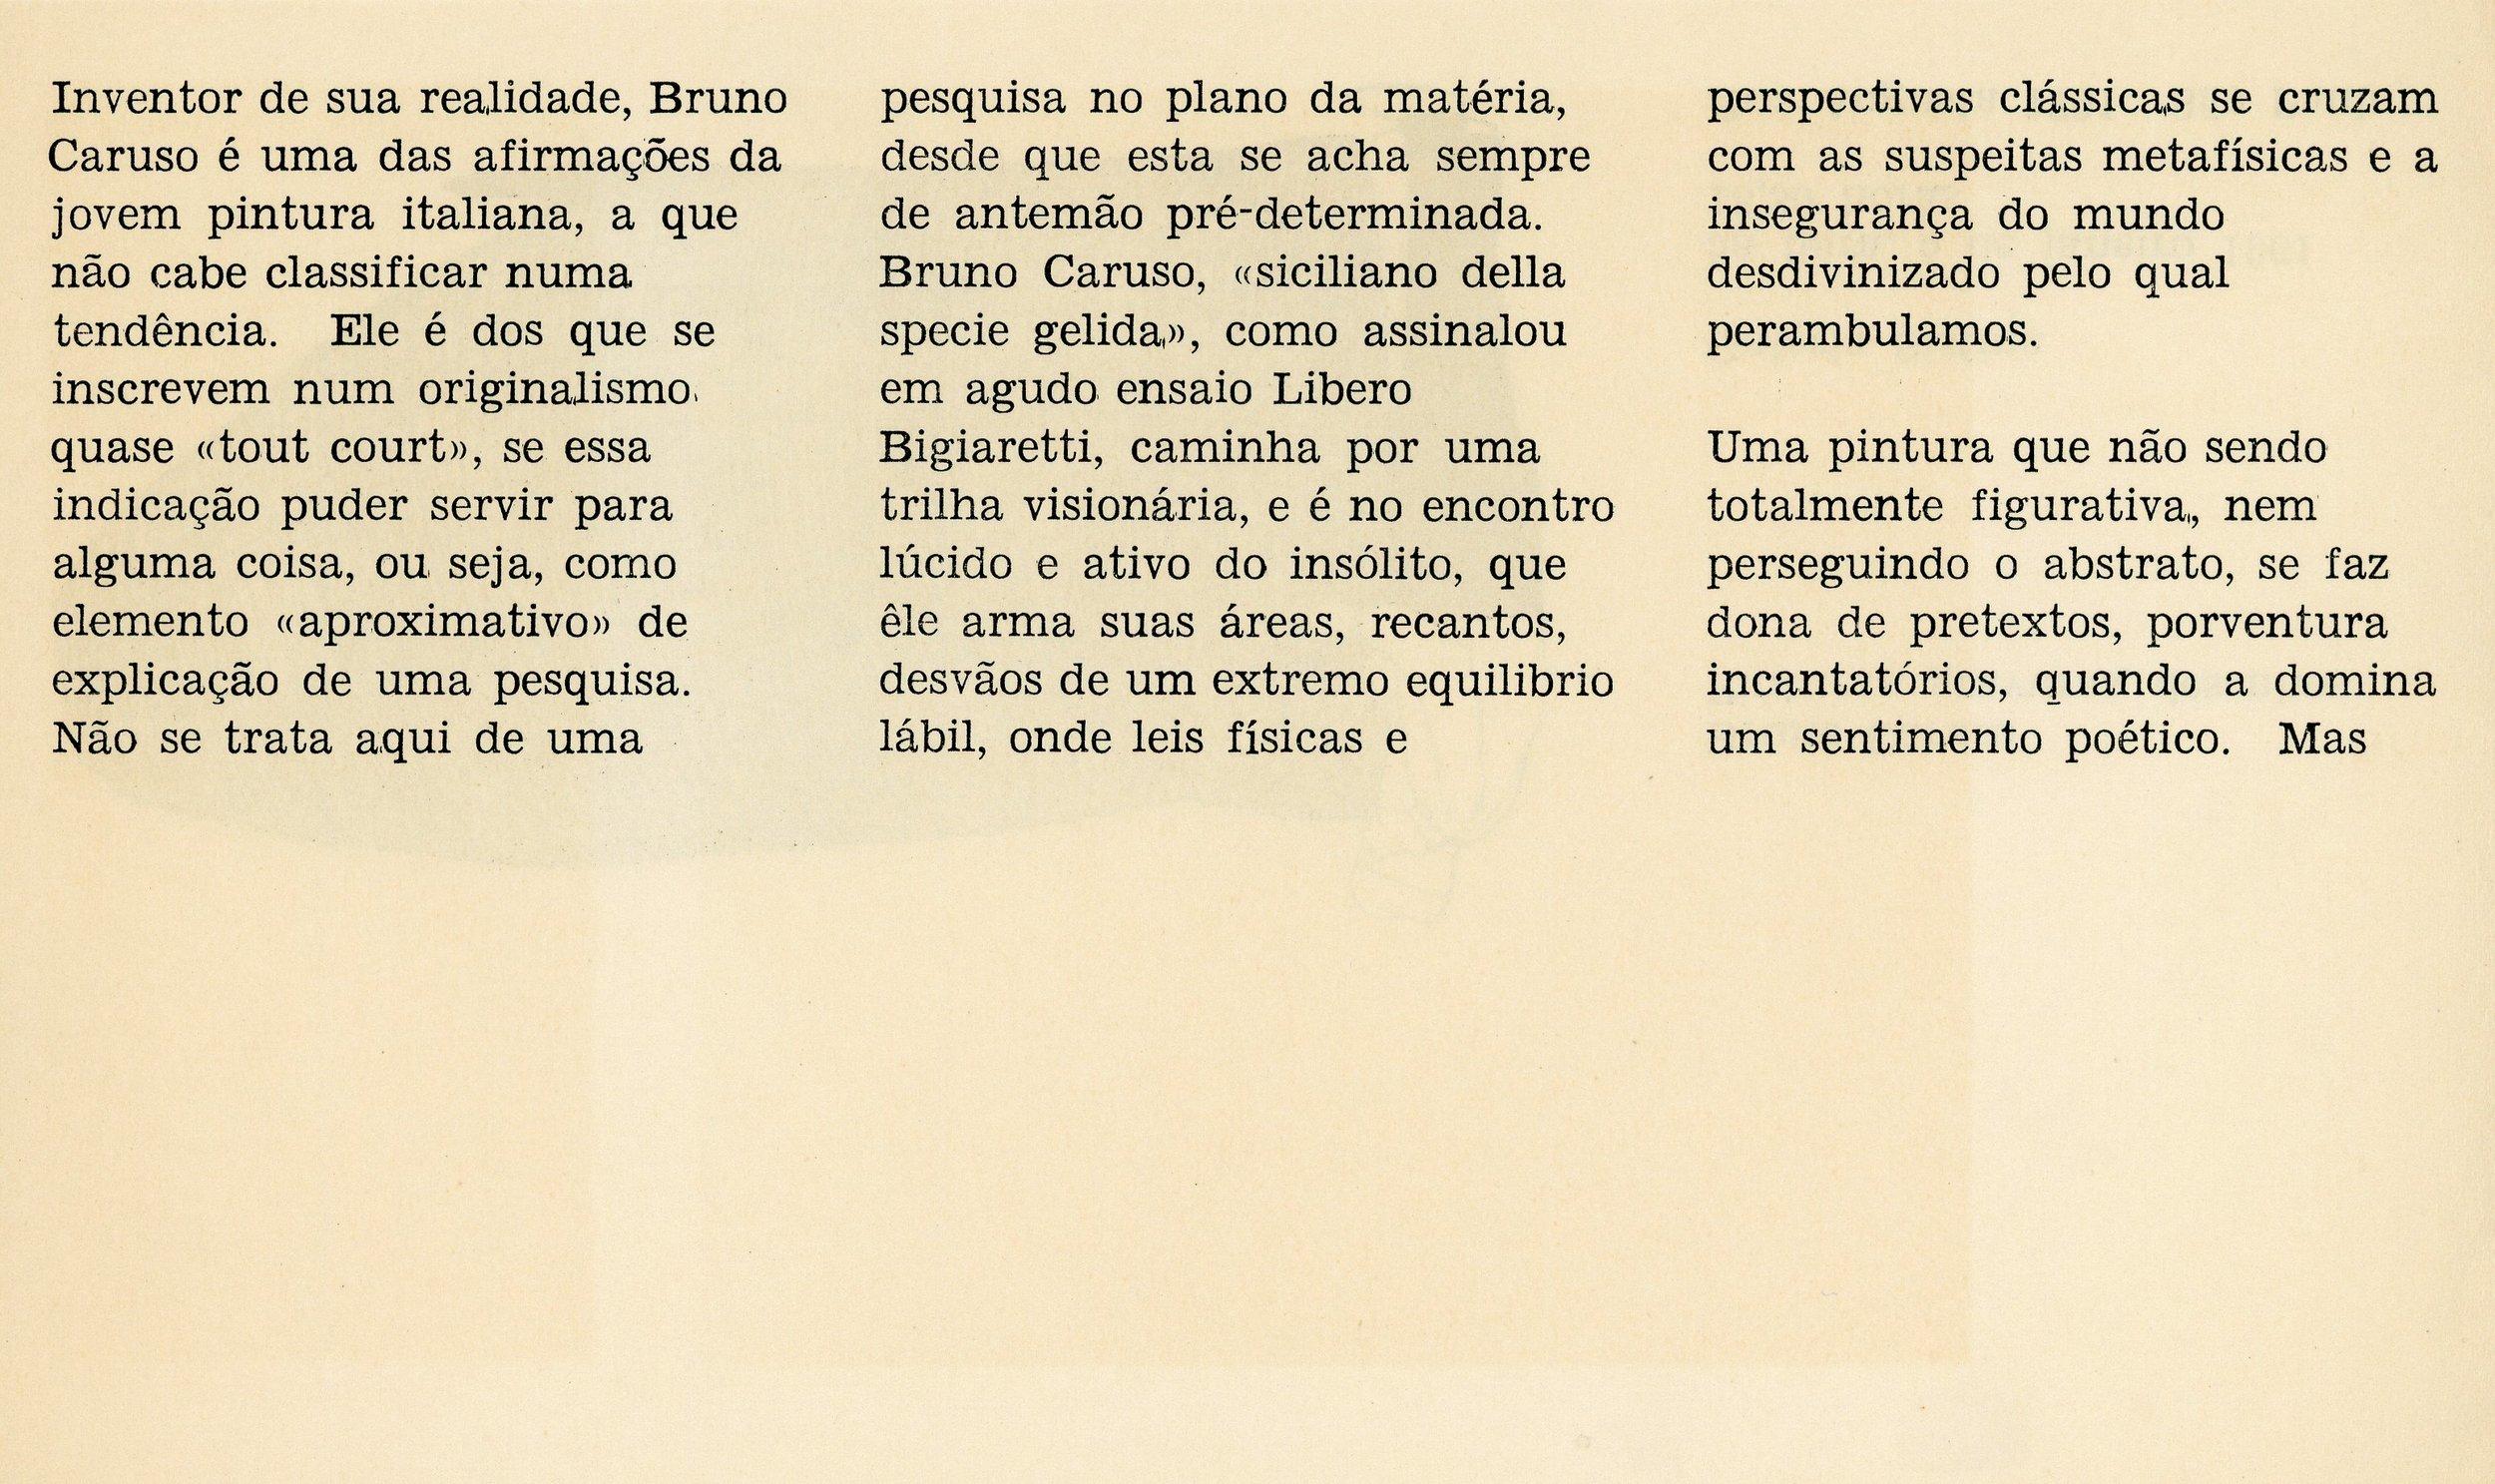 1961-01 Galeria Sistina - Bruno Caruso_03.jpg